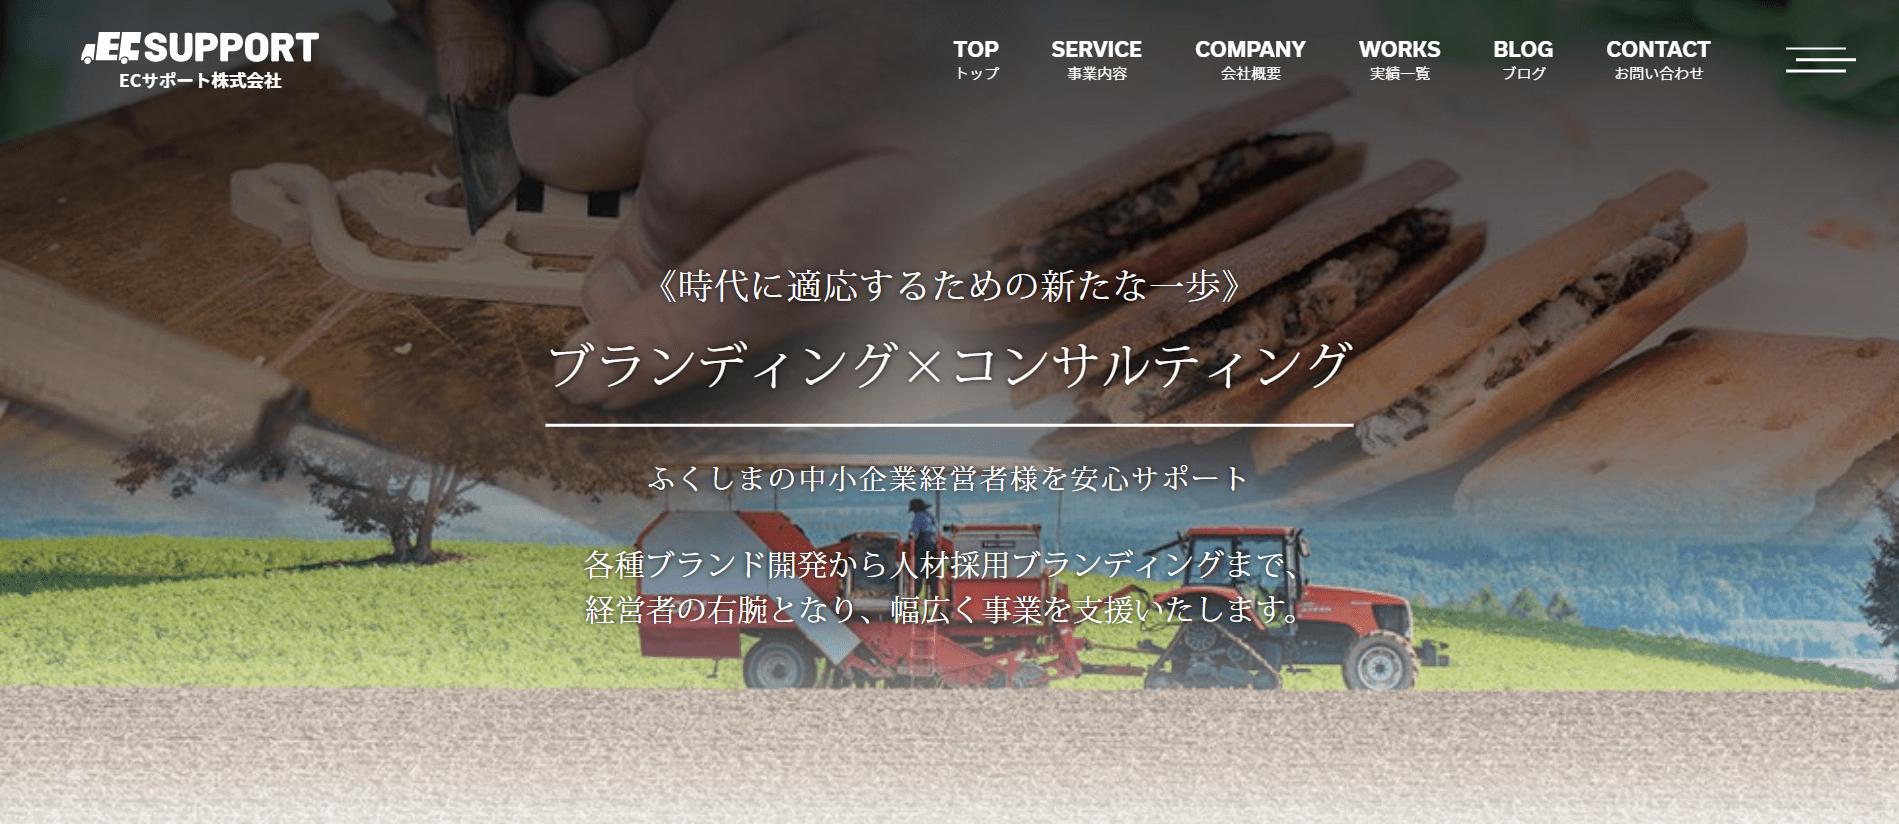 Shopify制作代行会社のECサポート株式会社